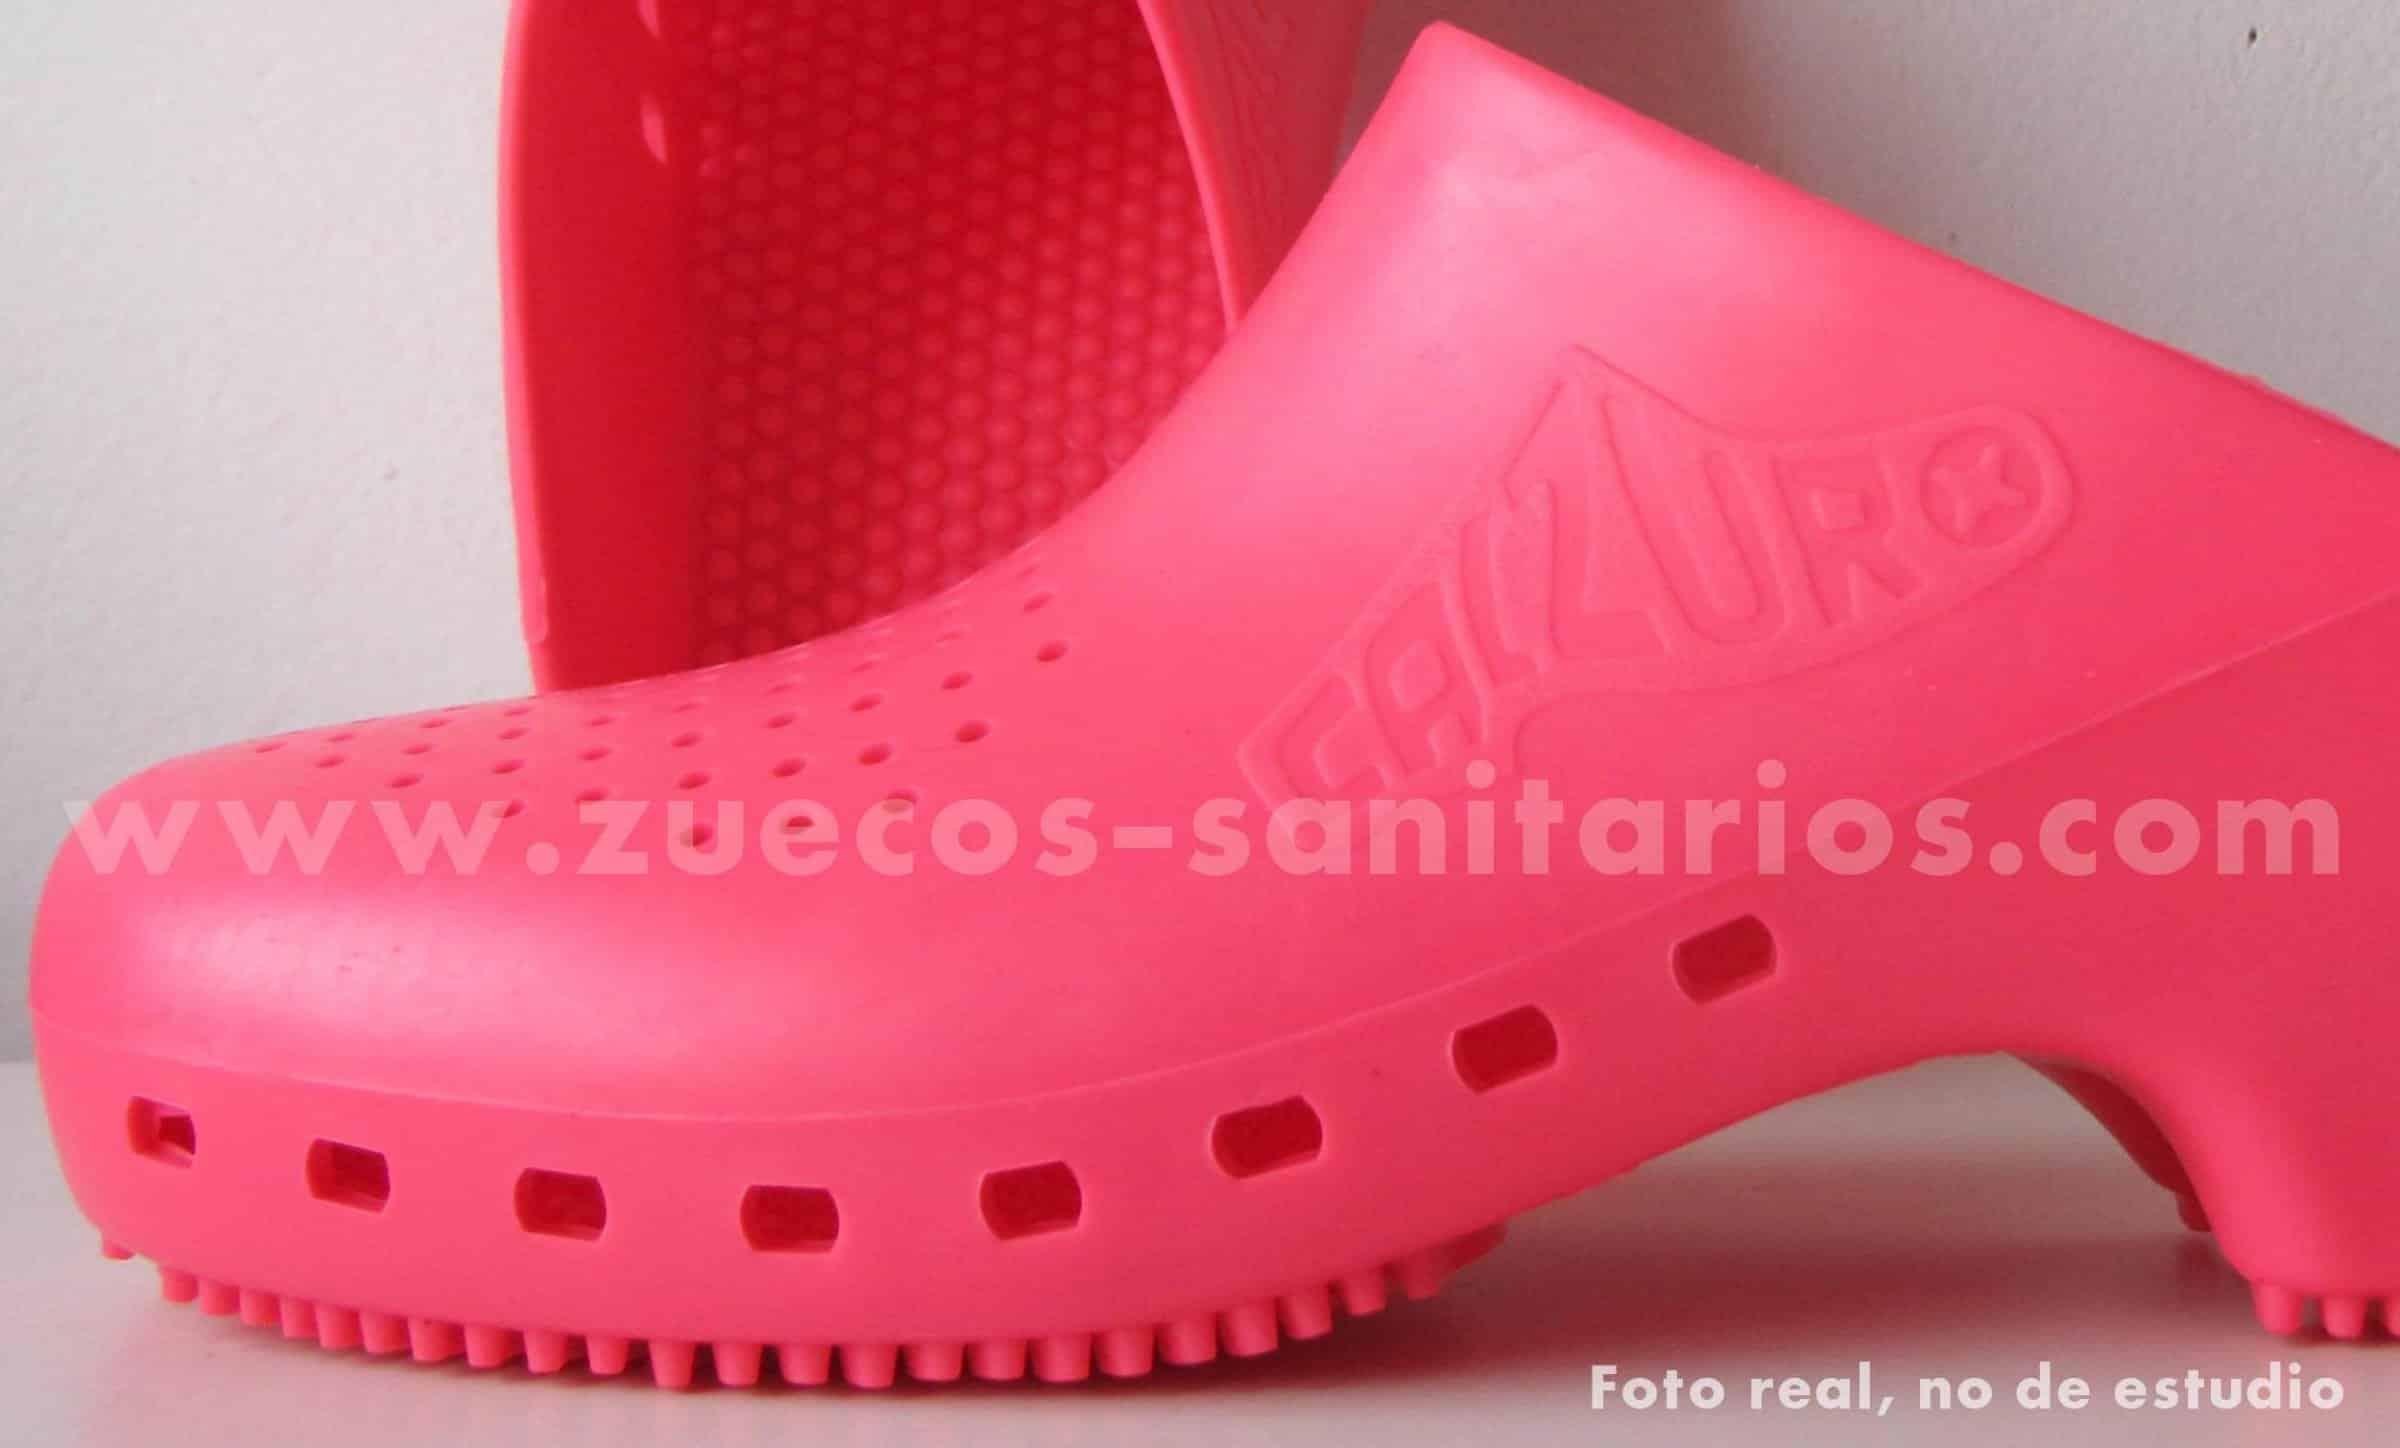 Zueco Sanitario Calzuro Rosa foto